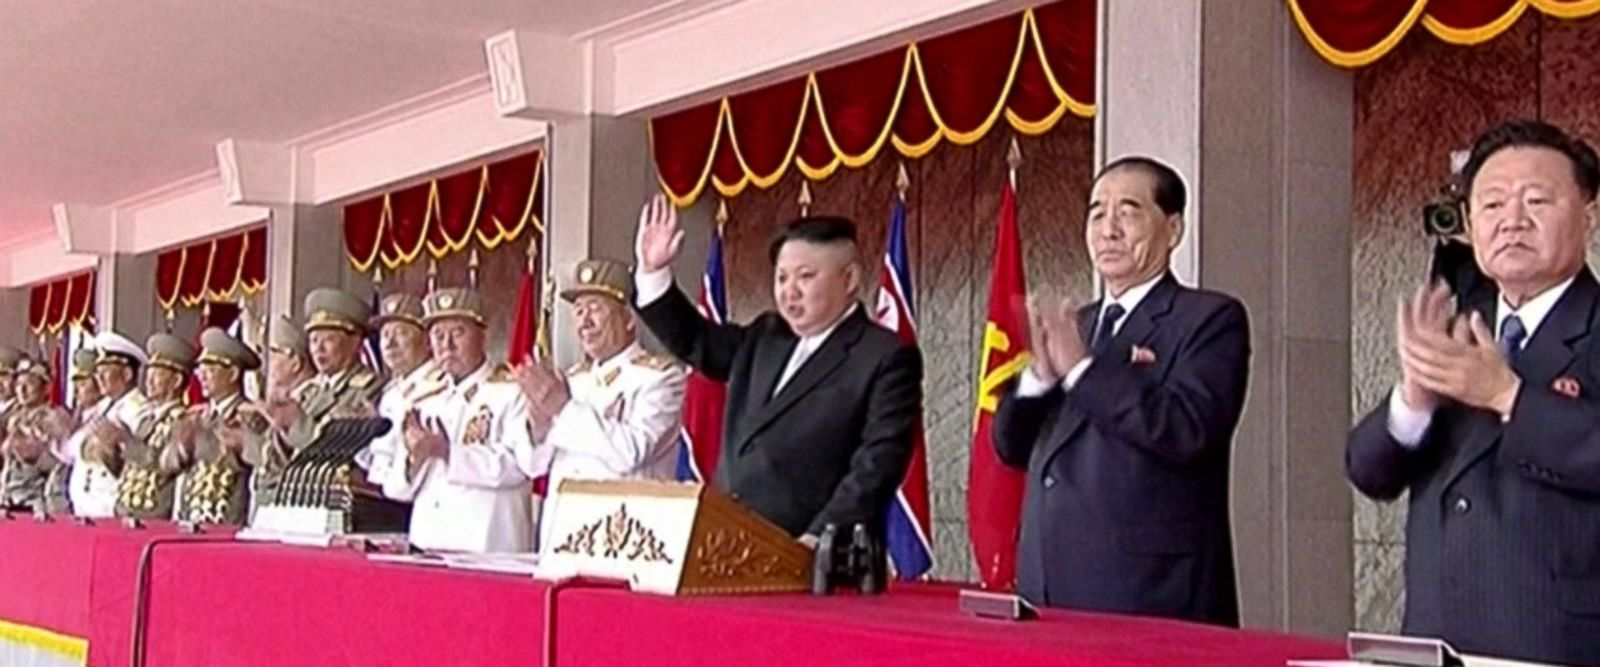 VIDEO: Trump names North Korea a 'state sponsor of terror'